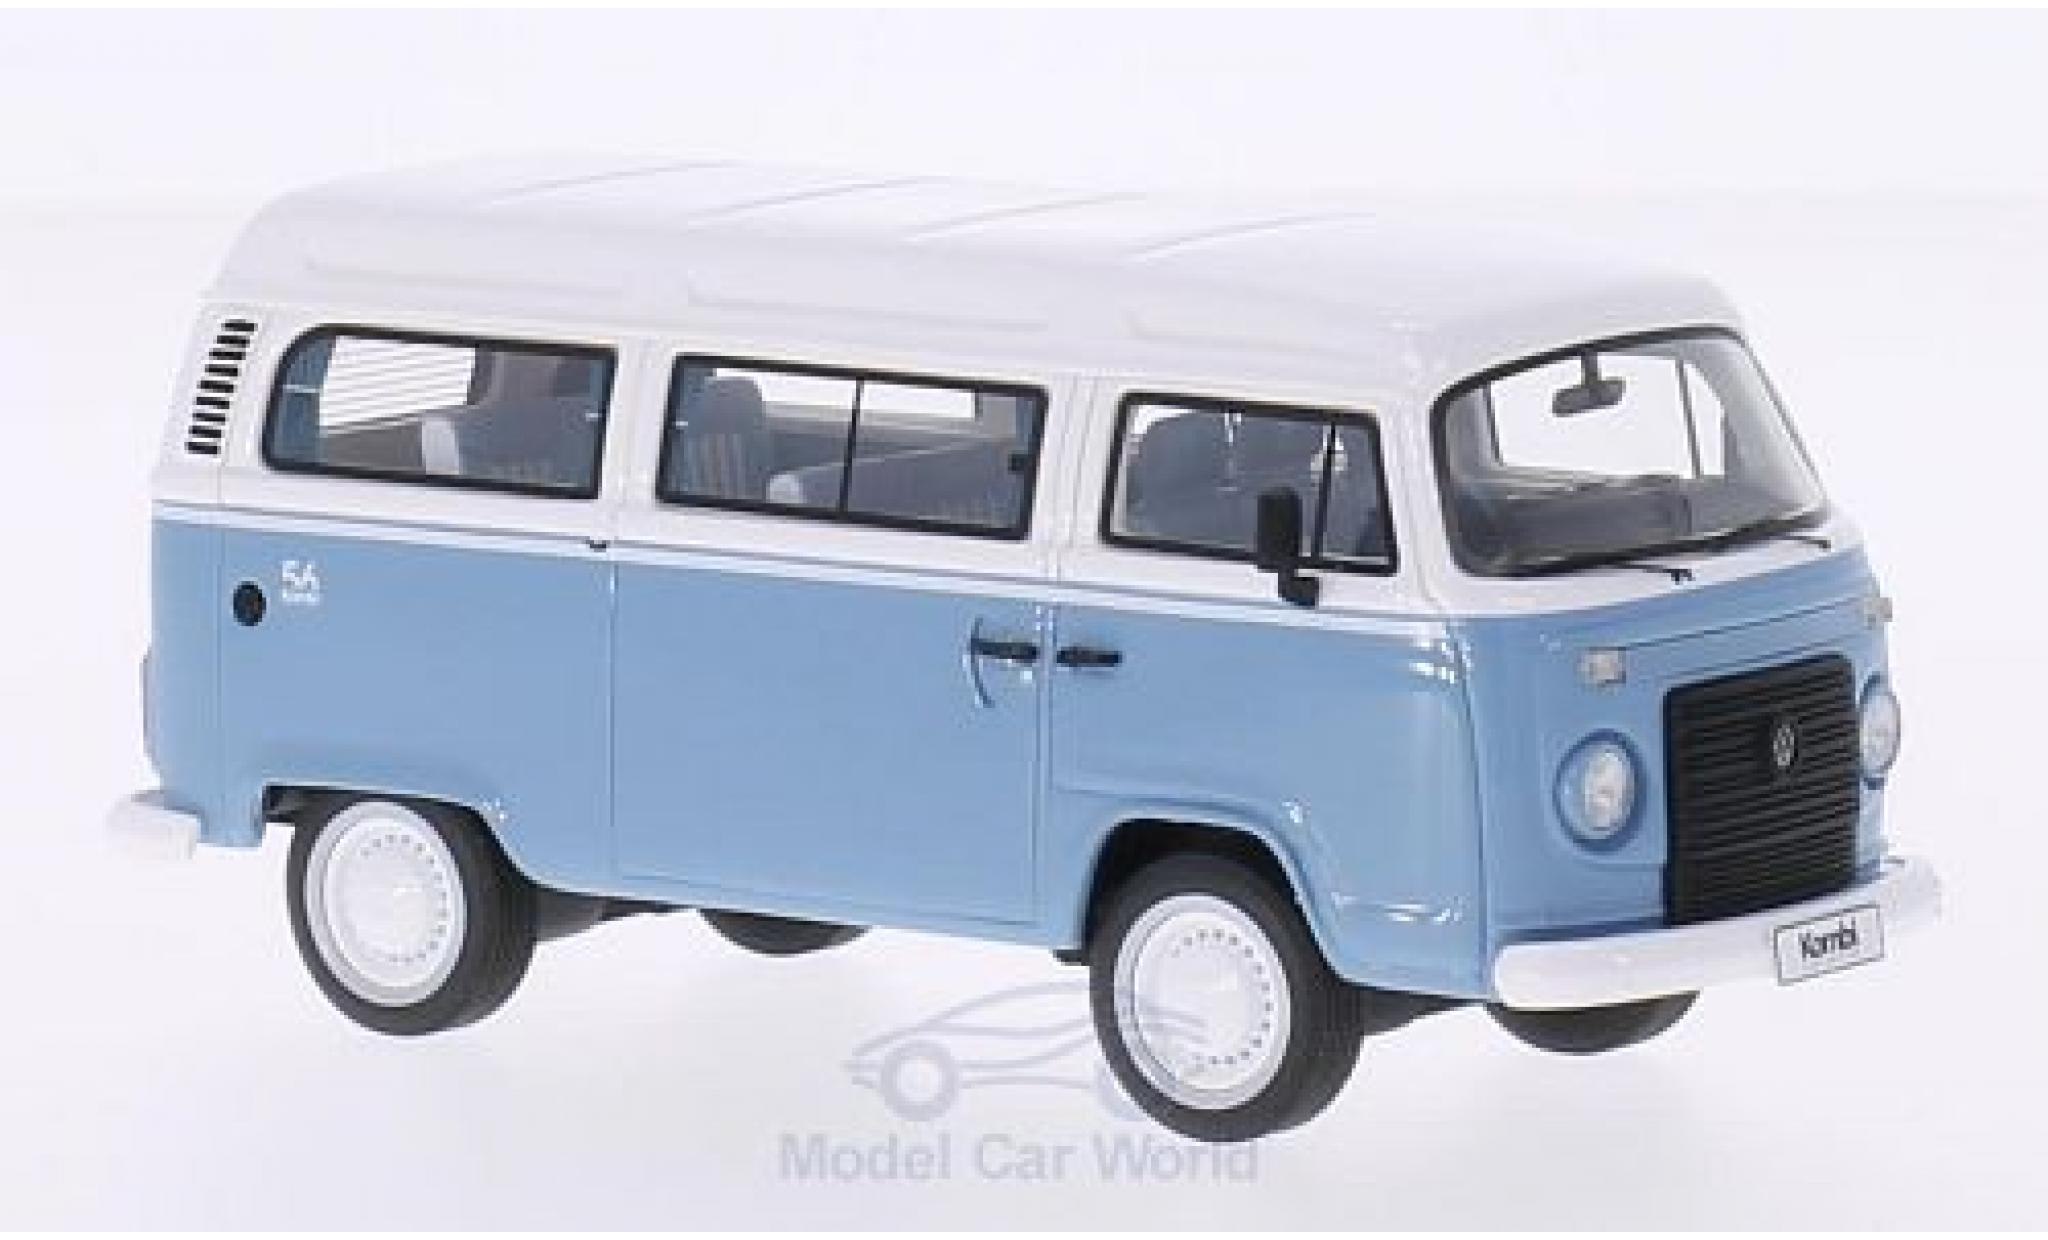 Volkswagen T2 B 1/43 Premium ClassiXXs c us razil blue/white 2013 Last Edition